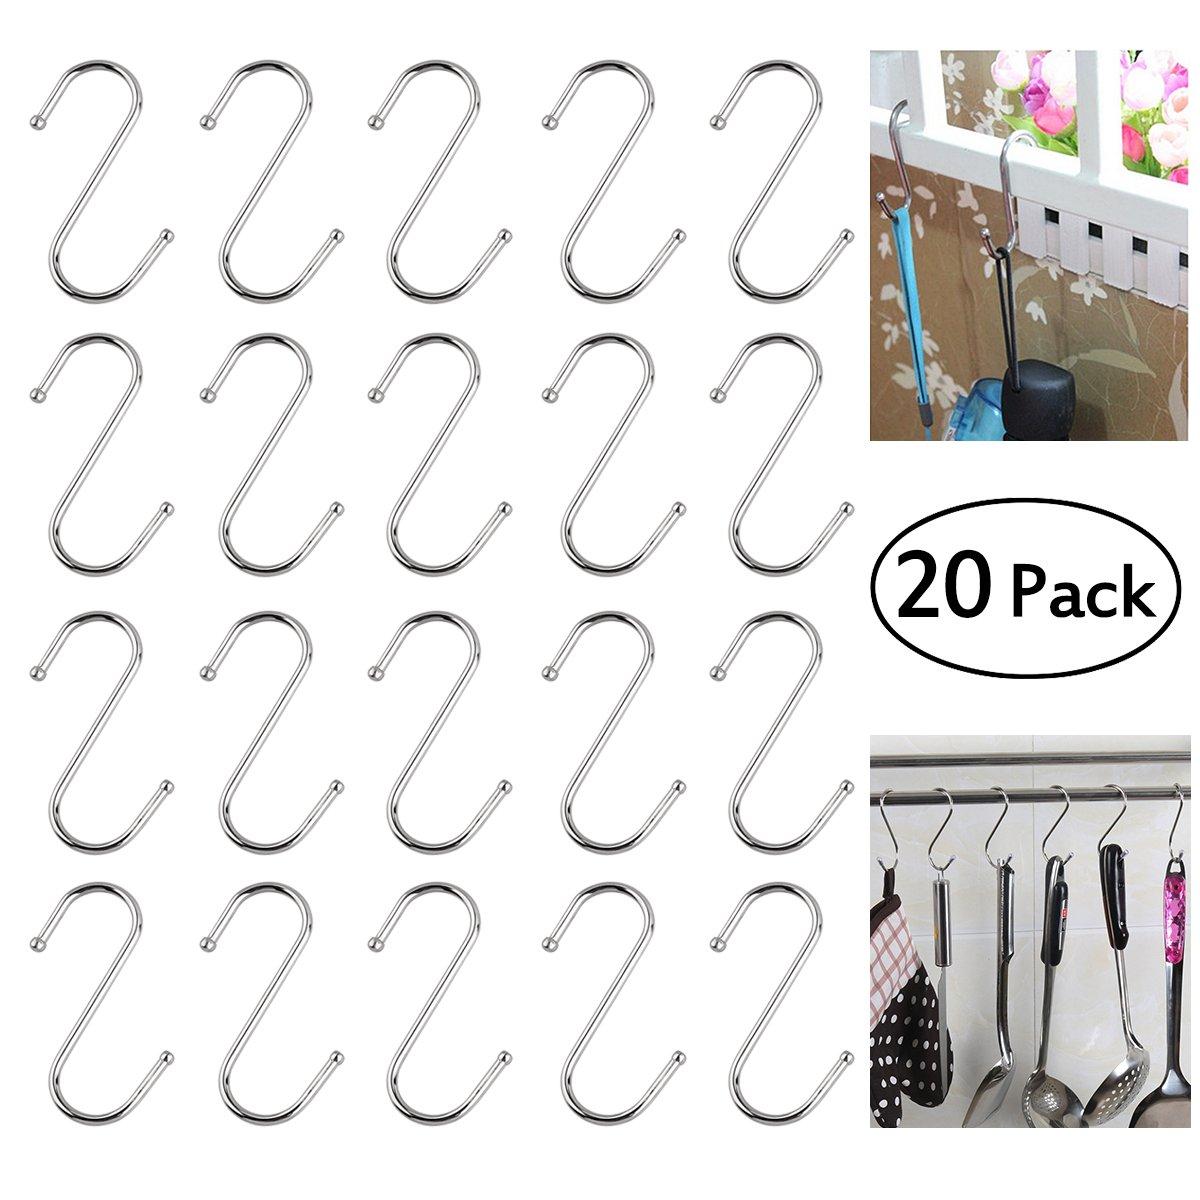 ULTNICE 20pcs Durable S-Shaped Anti-Rust Metal Hangers Metal Hooks Pothooks - Size S (Silver)